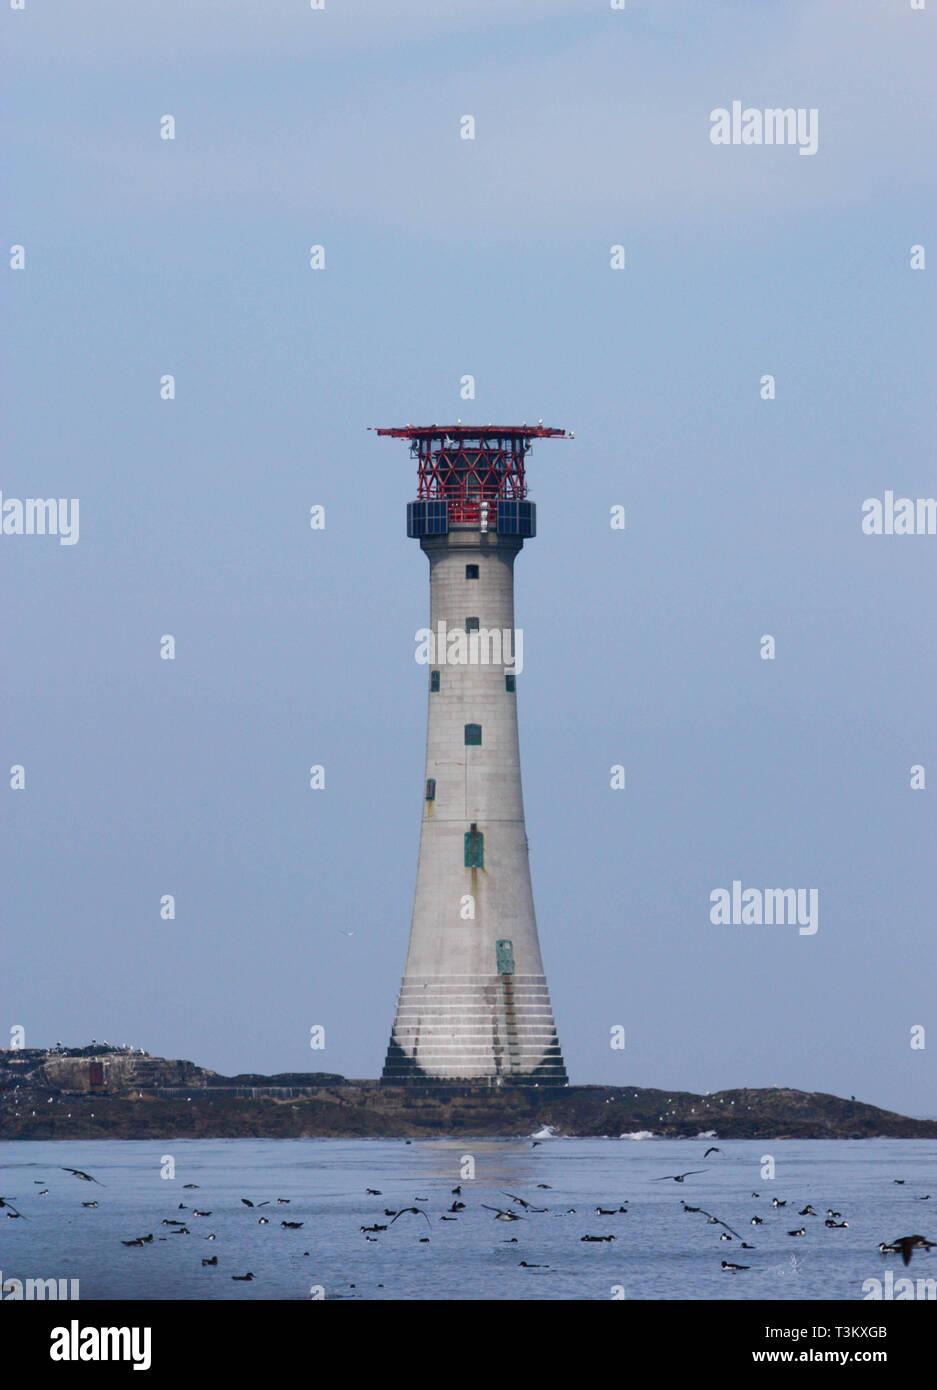 The historical landmark on the Pembrokeshire coastline - Smalls lighthouse - Stock Image